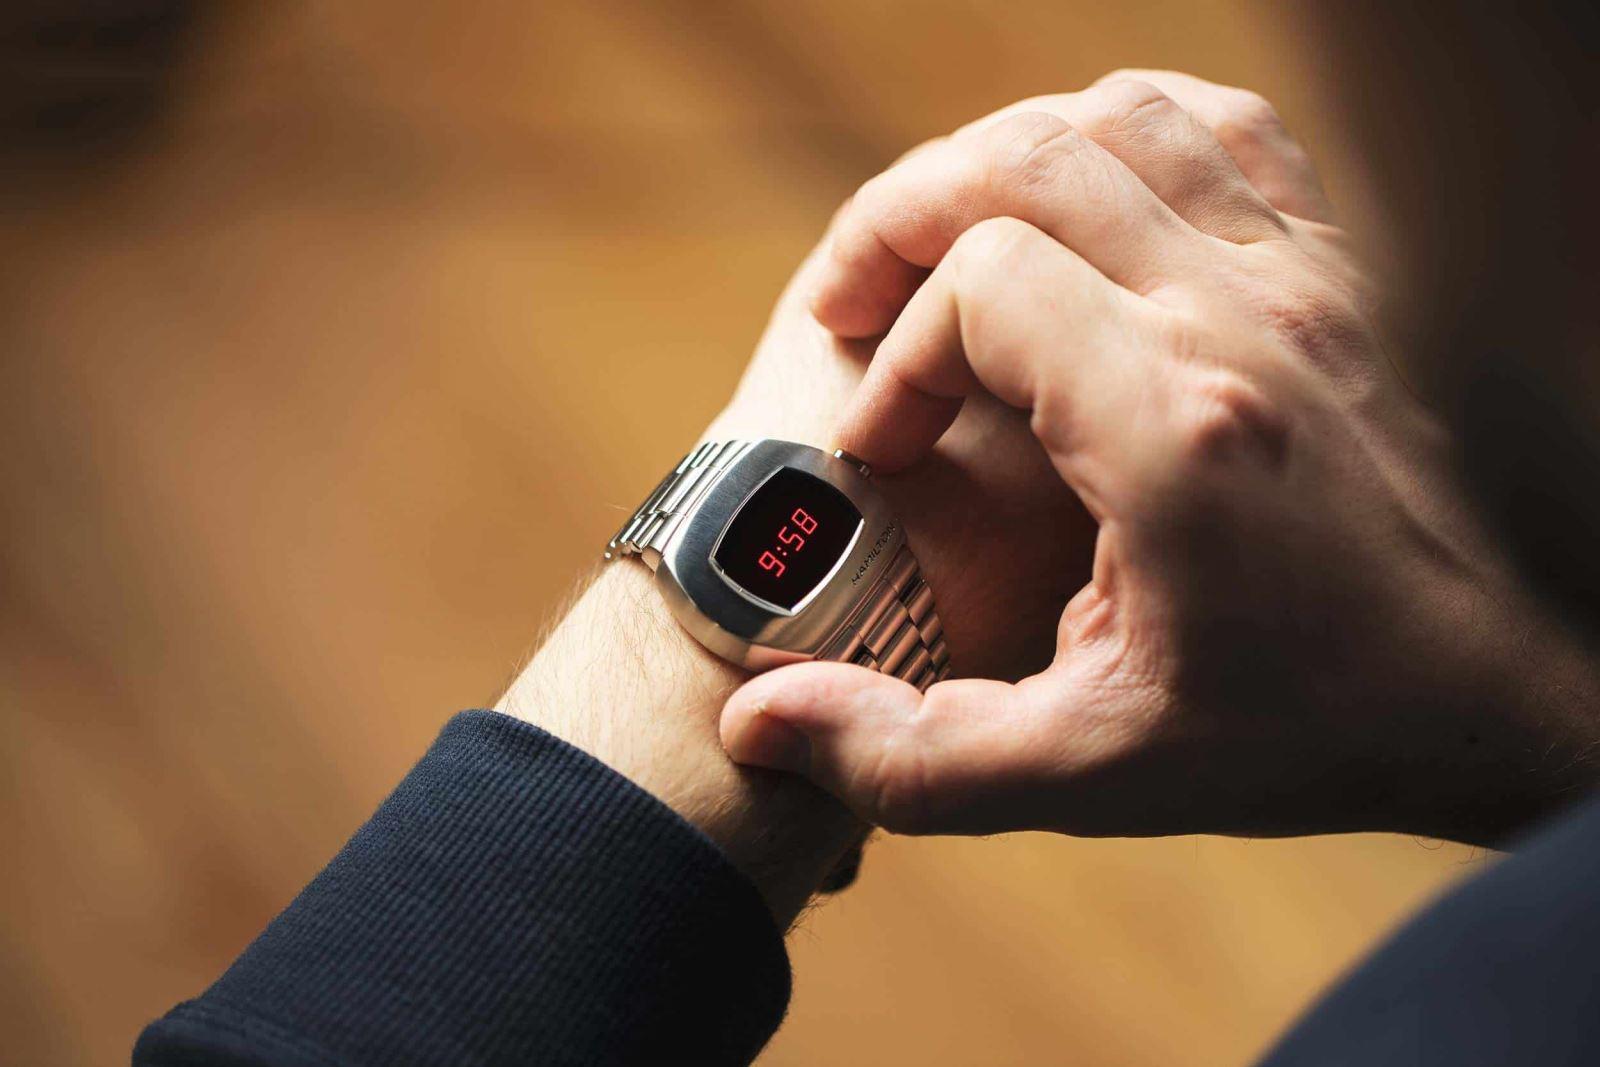 đồng hồ điện tử Hamilton PSR LED 2020